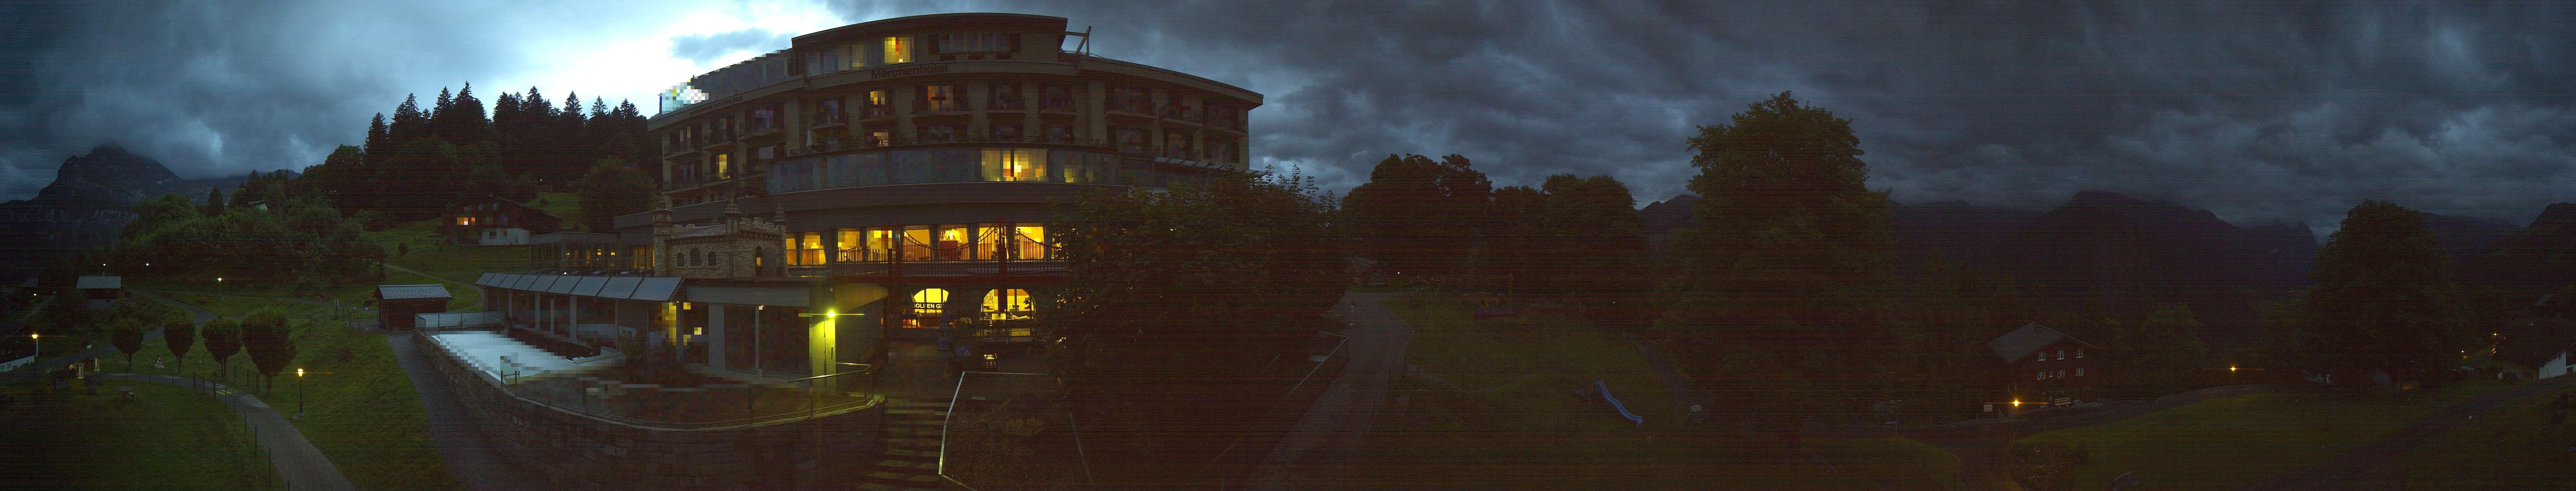 Webcam Märchenhotel Braunwald